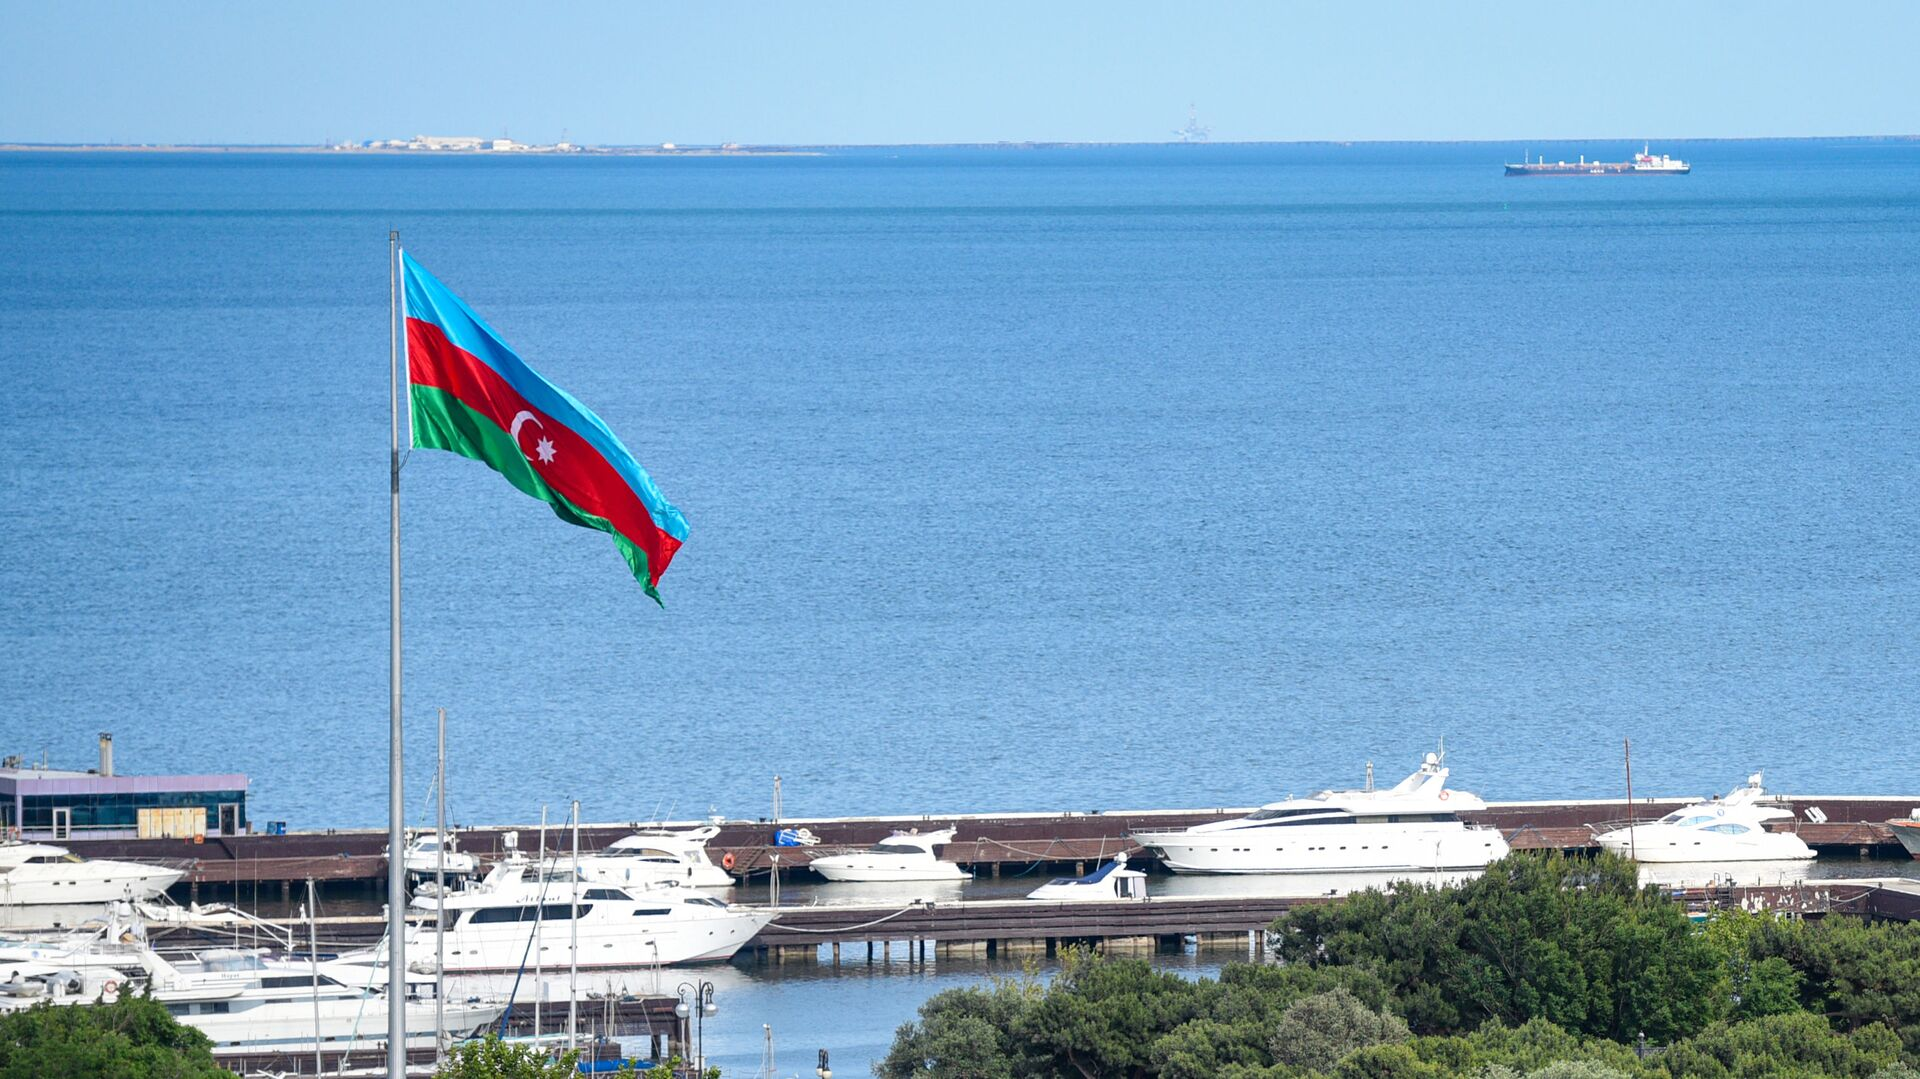 Флаг Азербайджана развевается на приморском бульваре, фото из архива - Sputnik Азербайджан, 1920, 08.08.2021